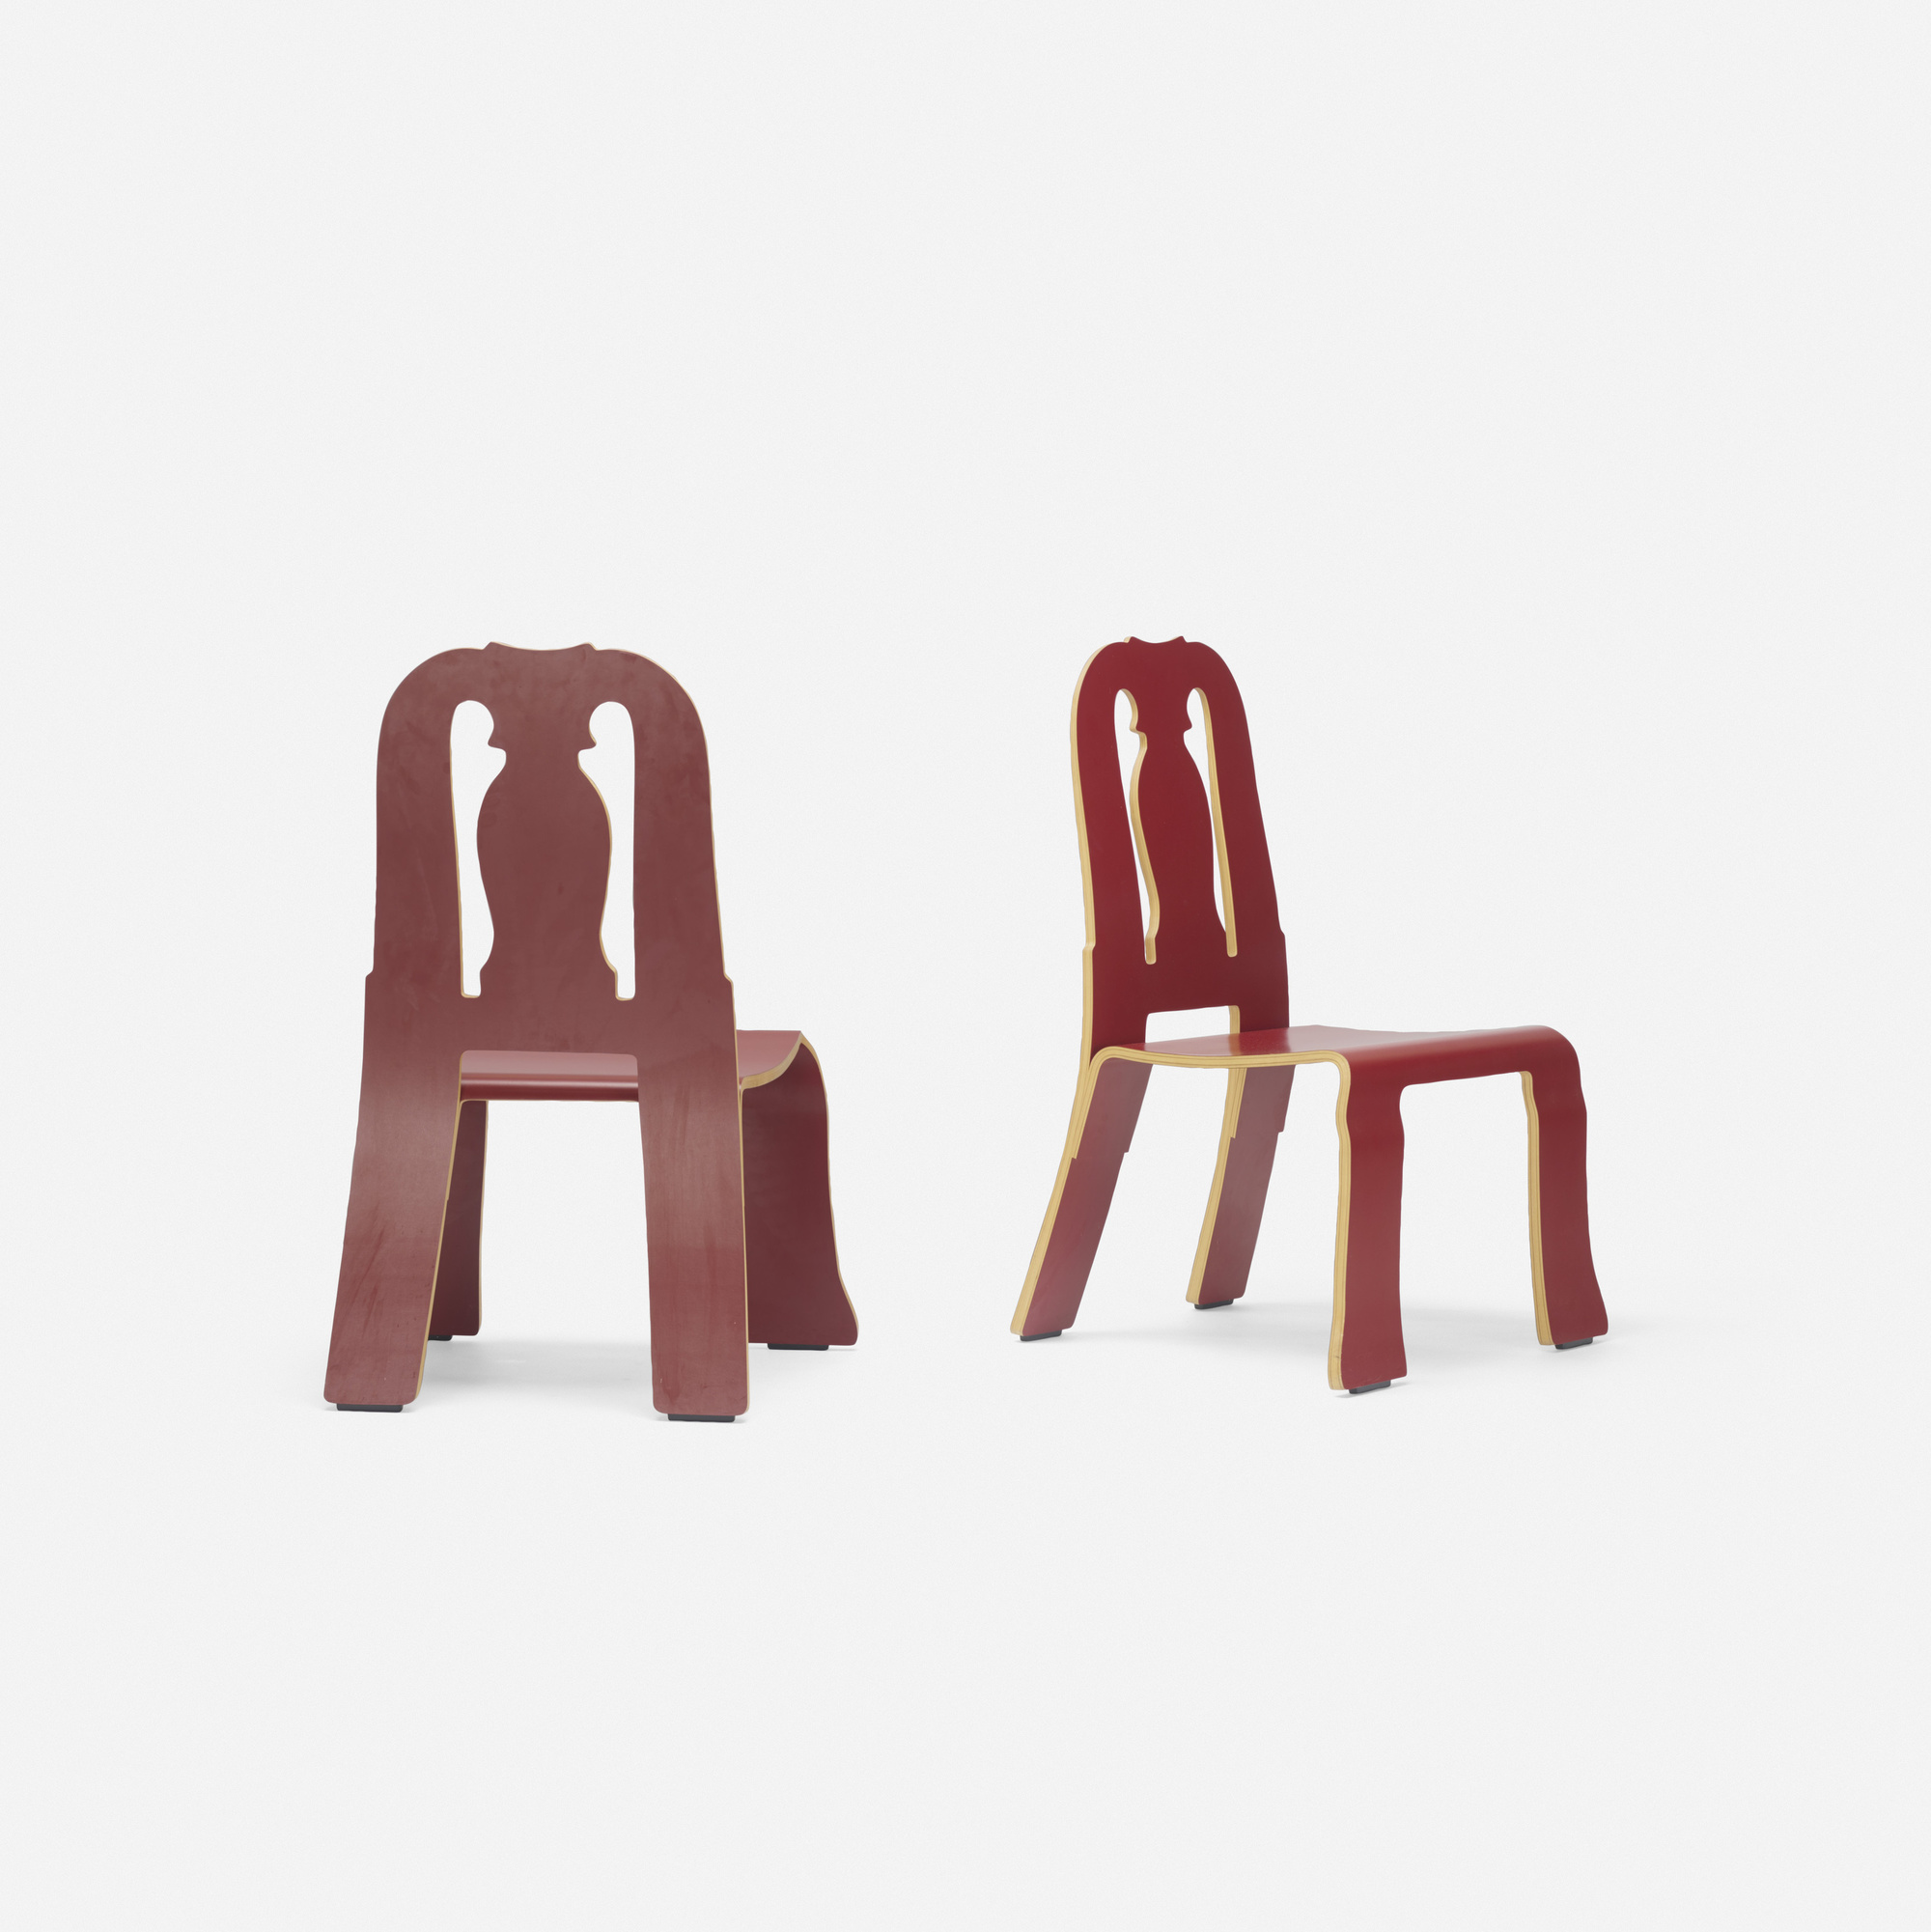 211: Robert Venturi with Denise Scott Brown / Queen Anne chairs, pair (2 of 3)